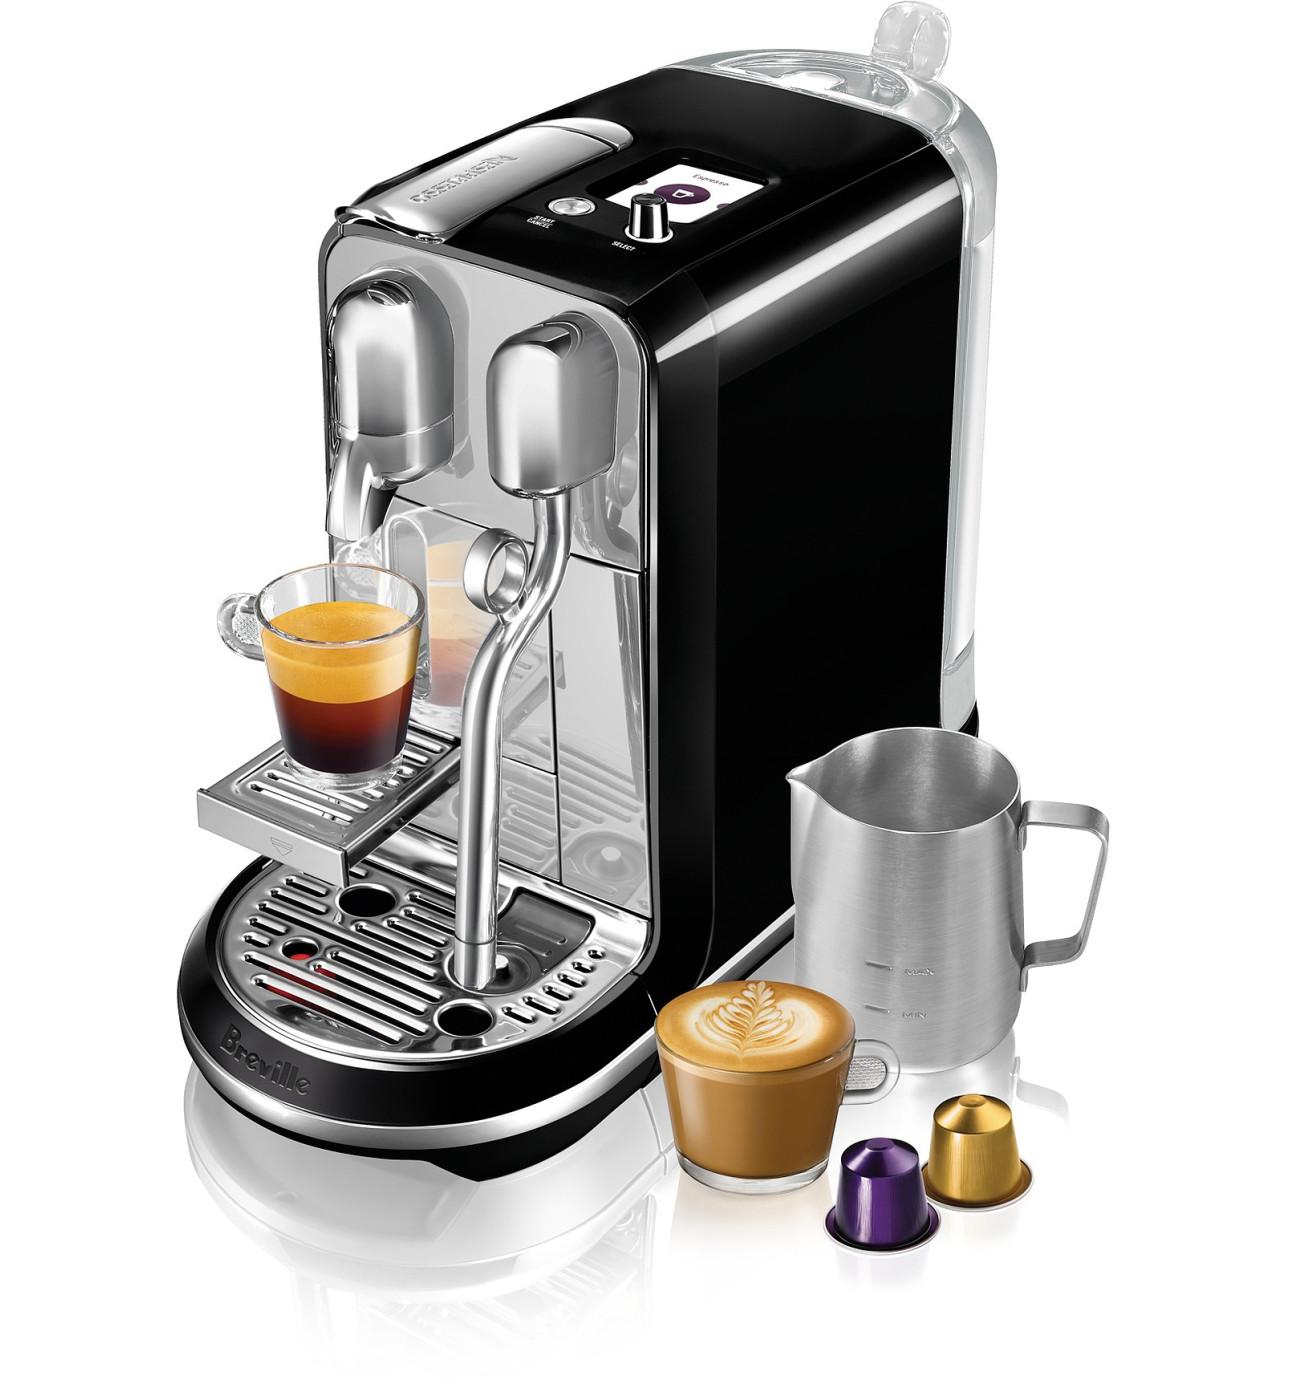 Electronic David Jones Coffee Machines david jones coffee machines grinders delonghi bne600slq creatista capsule machine salted liquorice